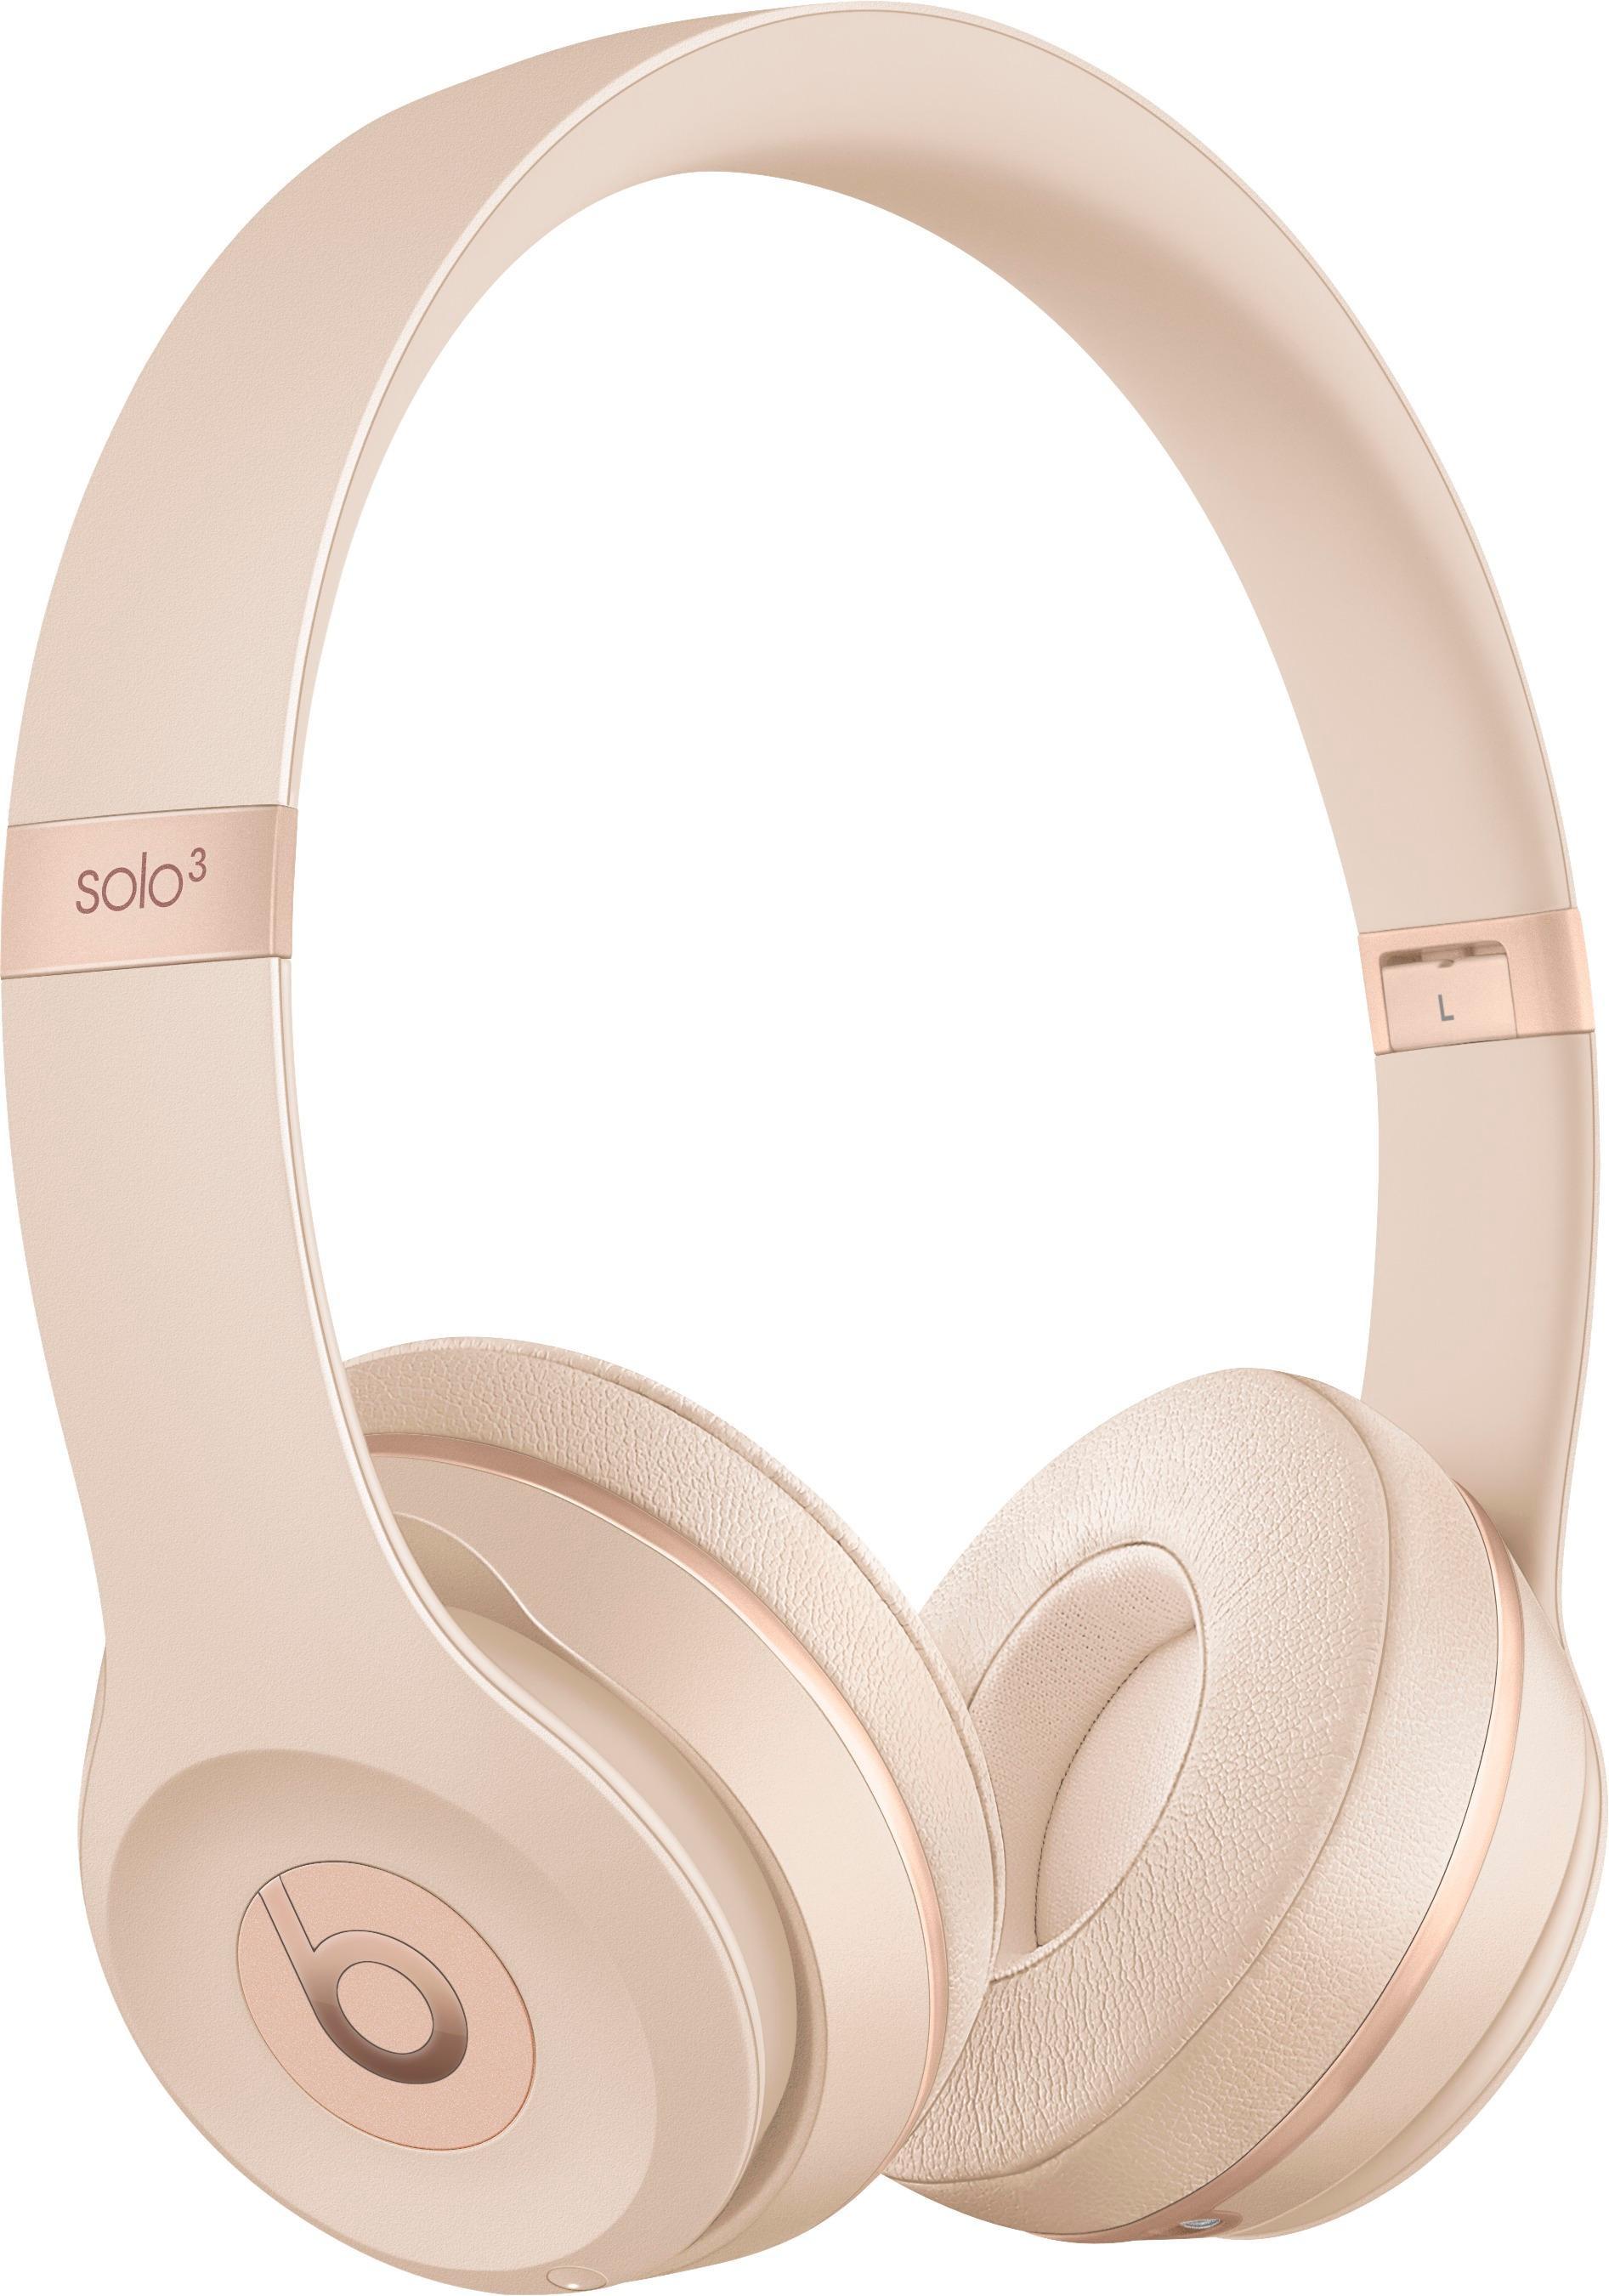 Beats Solo 3 Wireless Headphone Matte Gold